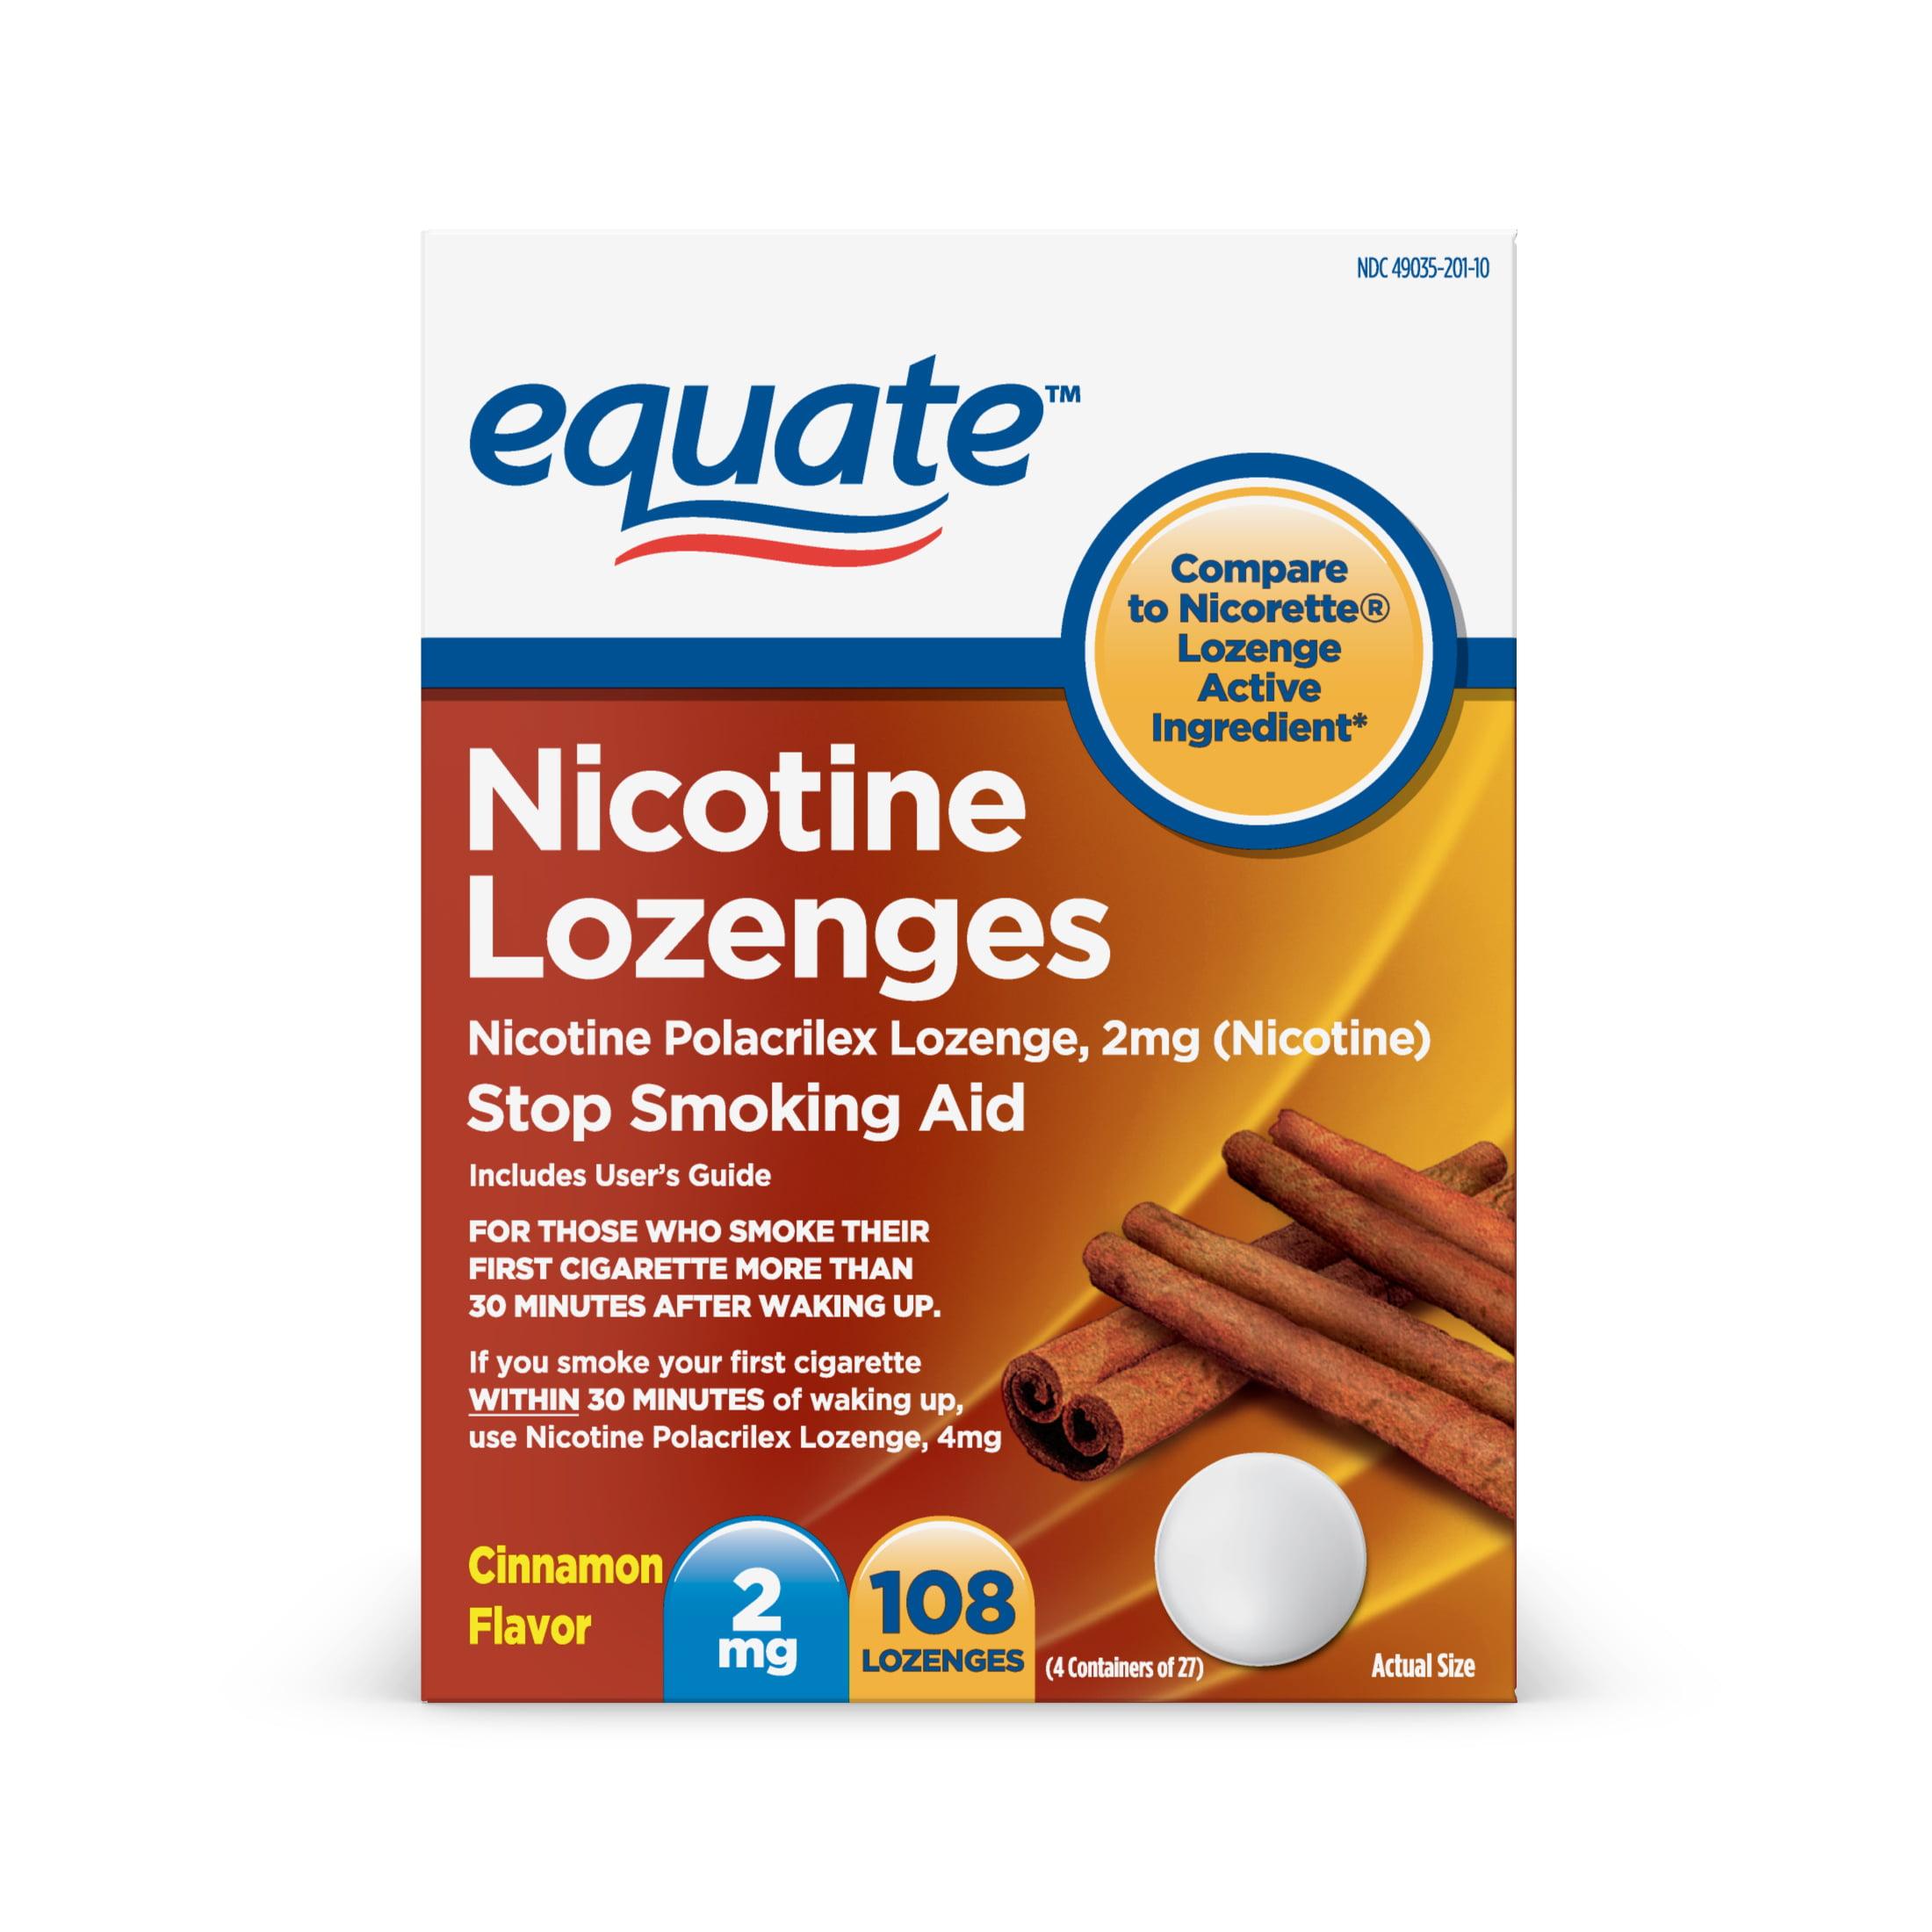 Equate Nicotine Cinnamon Flavor Lozenges, 2 mg, 108 Count